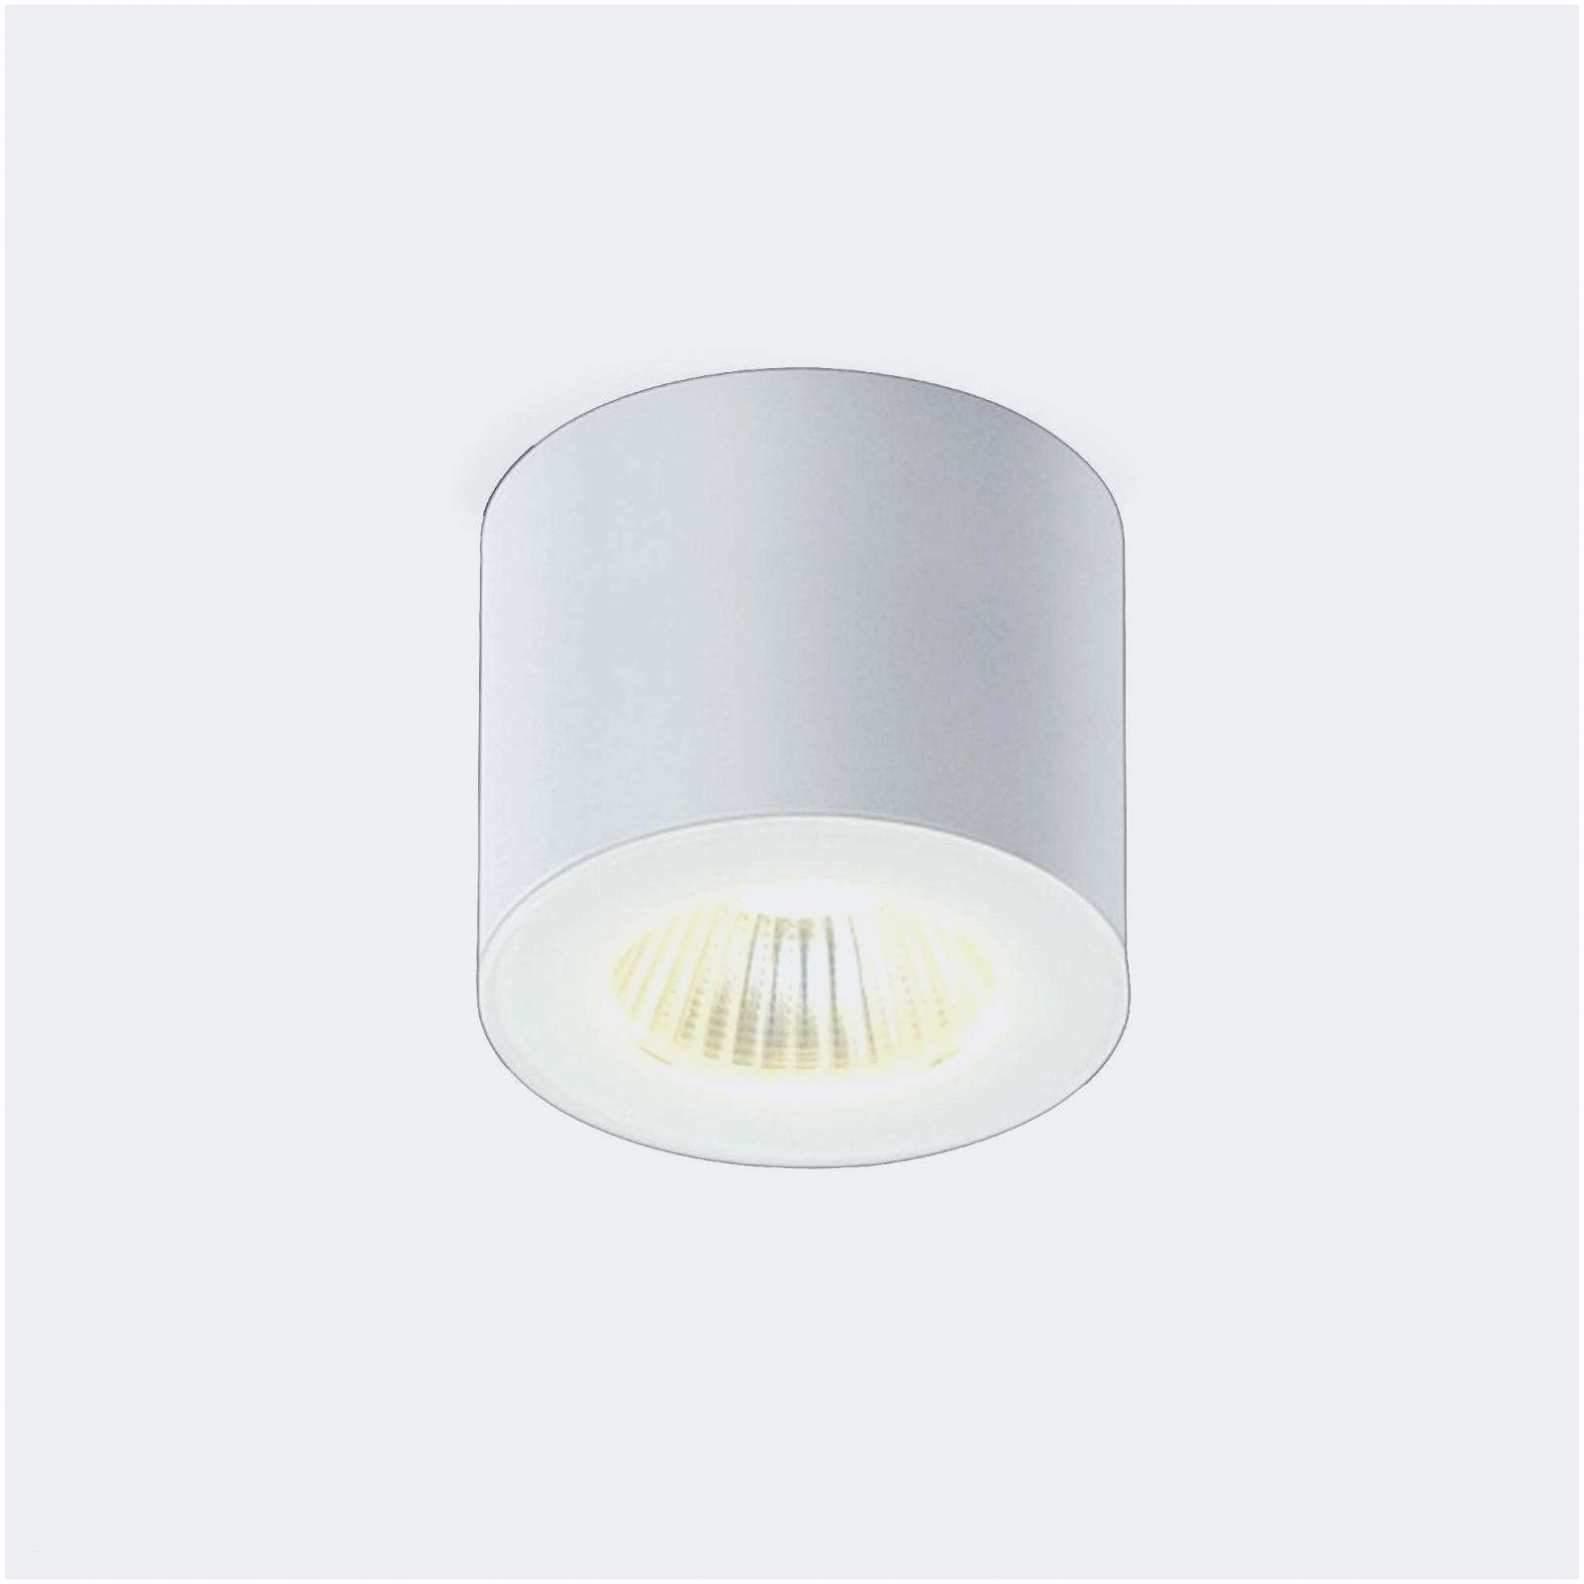 Full Size of Lampen Schlafzimmer Ikea Wohnzimmer Frisch 30 Schn Betten Landhaus Lampe Deckenleuchte Nolte Regal Wandlampe Massivholz Eckschrank Romantische Stehlampen Schlafzimmer Lampen Schlafzimmer